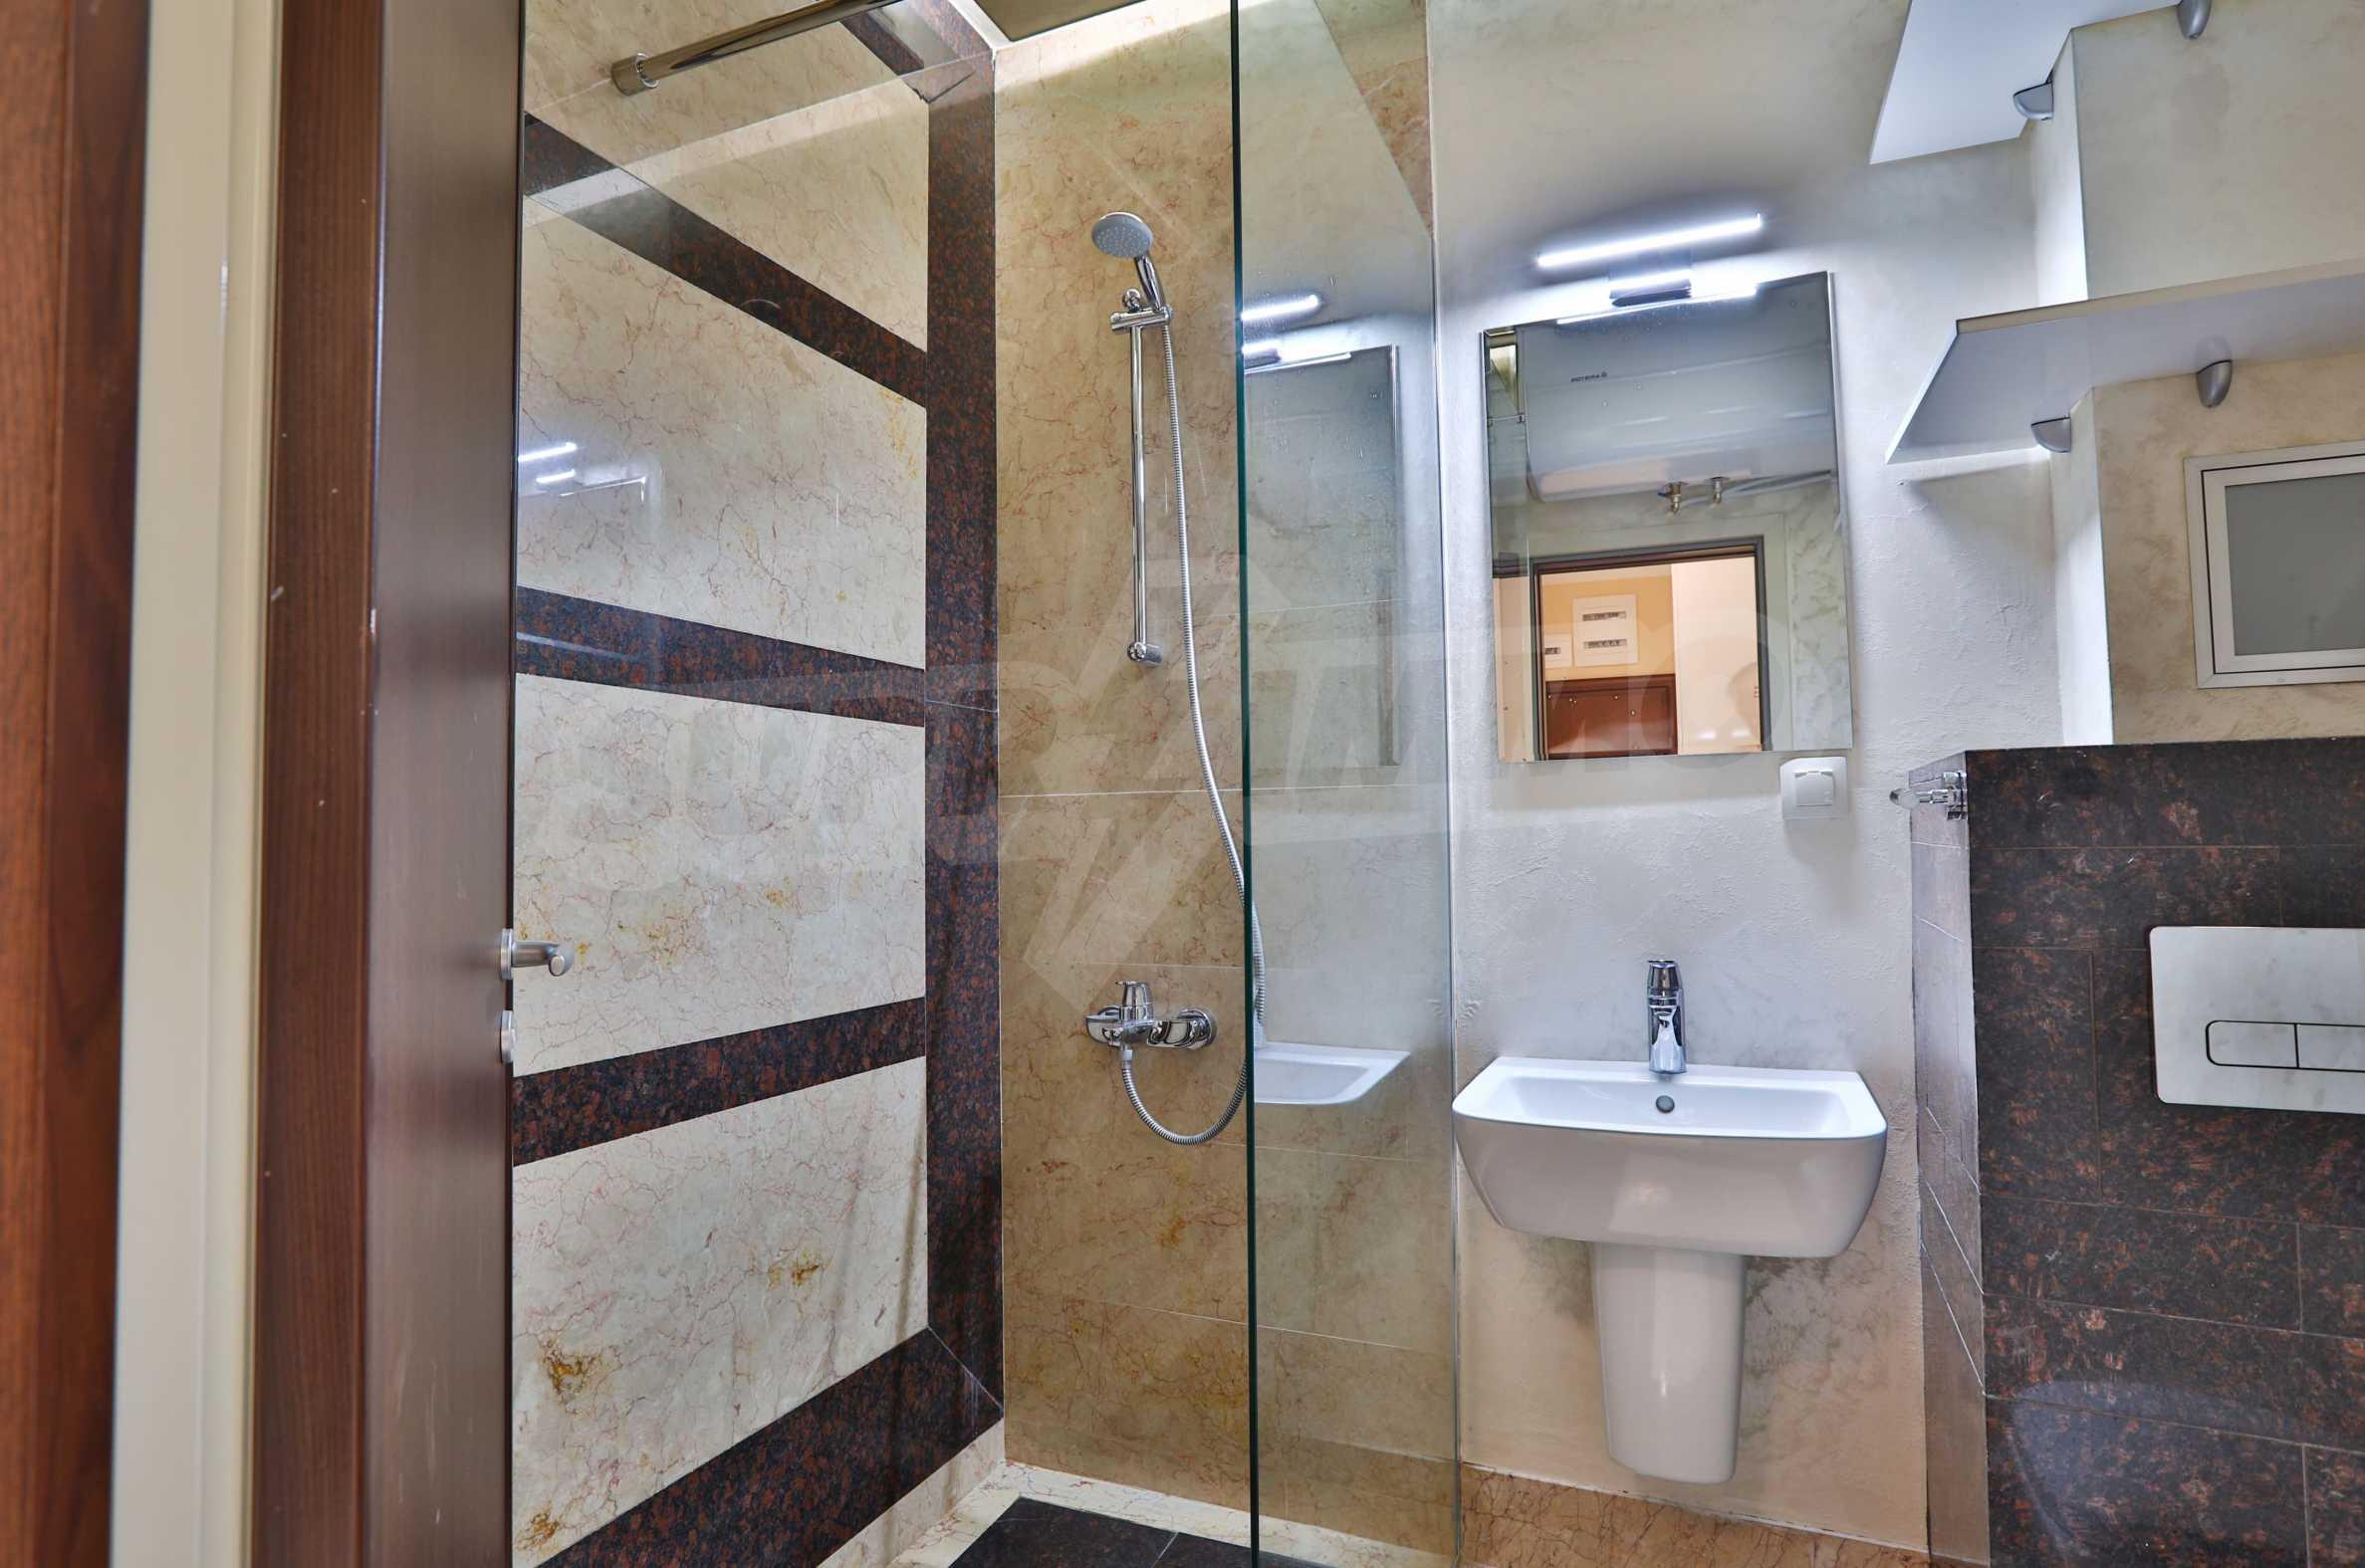 Дизайнерски тристаен апартамент под наем за летен сезон в резиденция Belle Époque в Лозенец 24